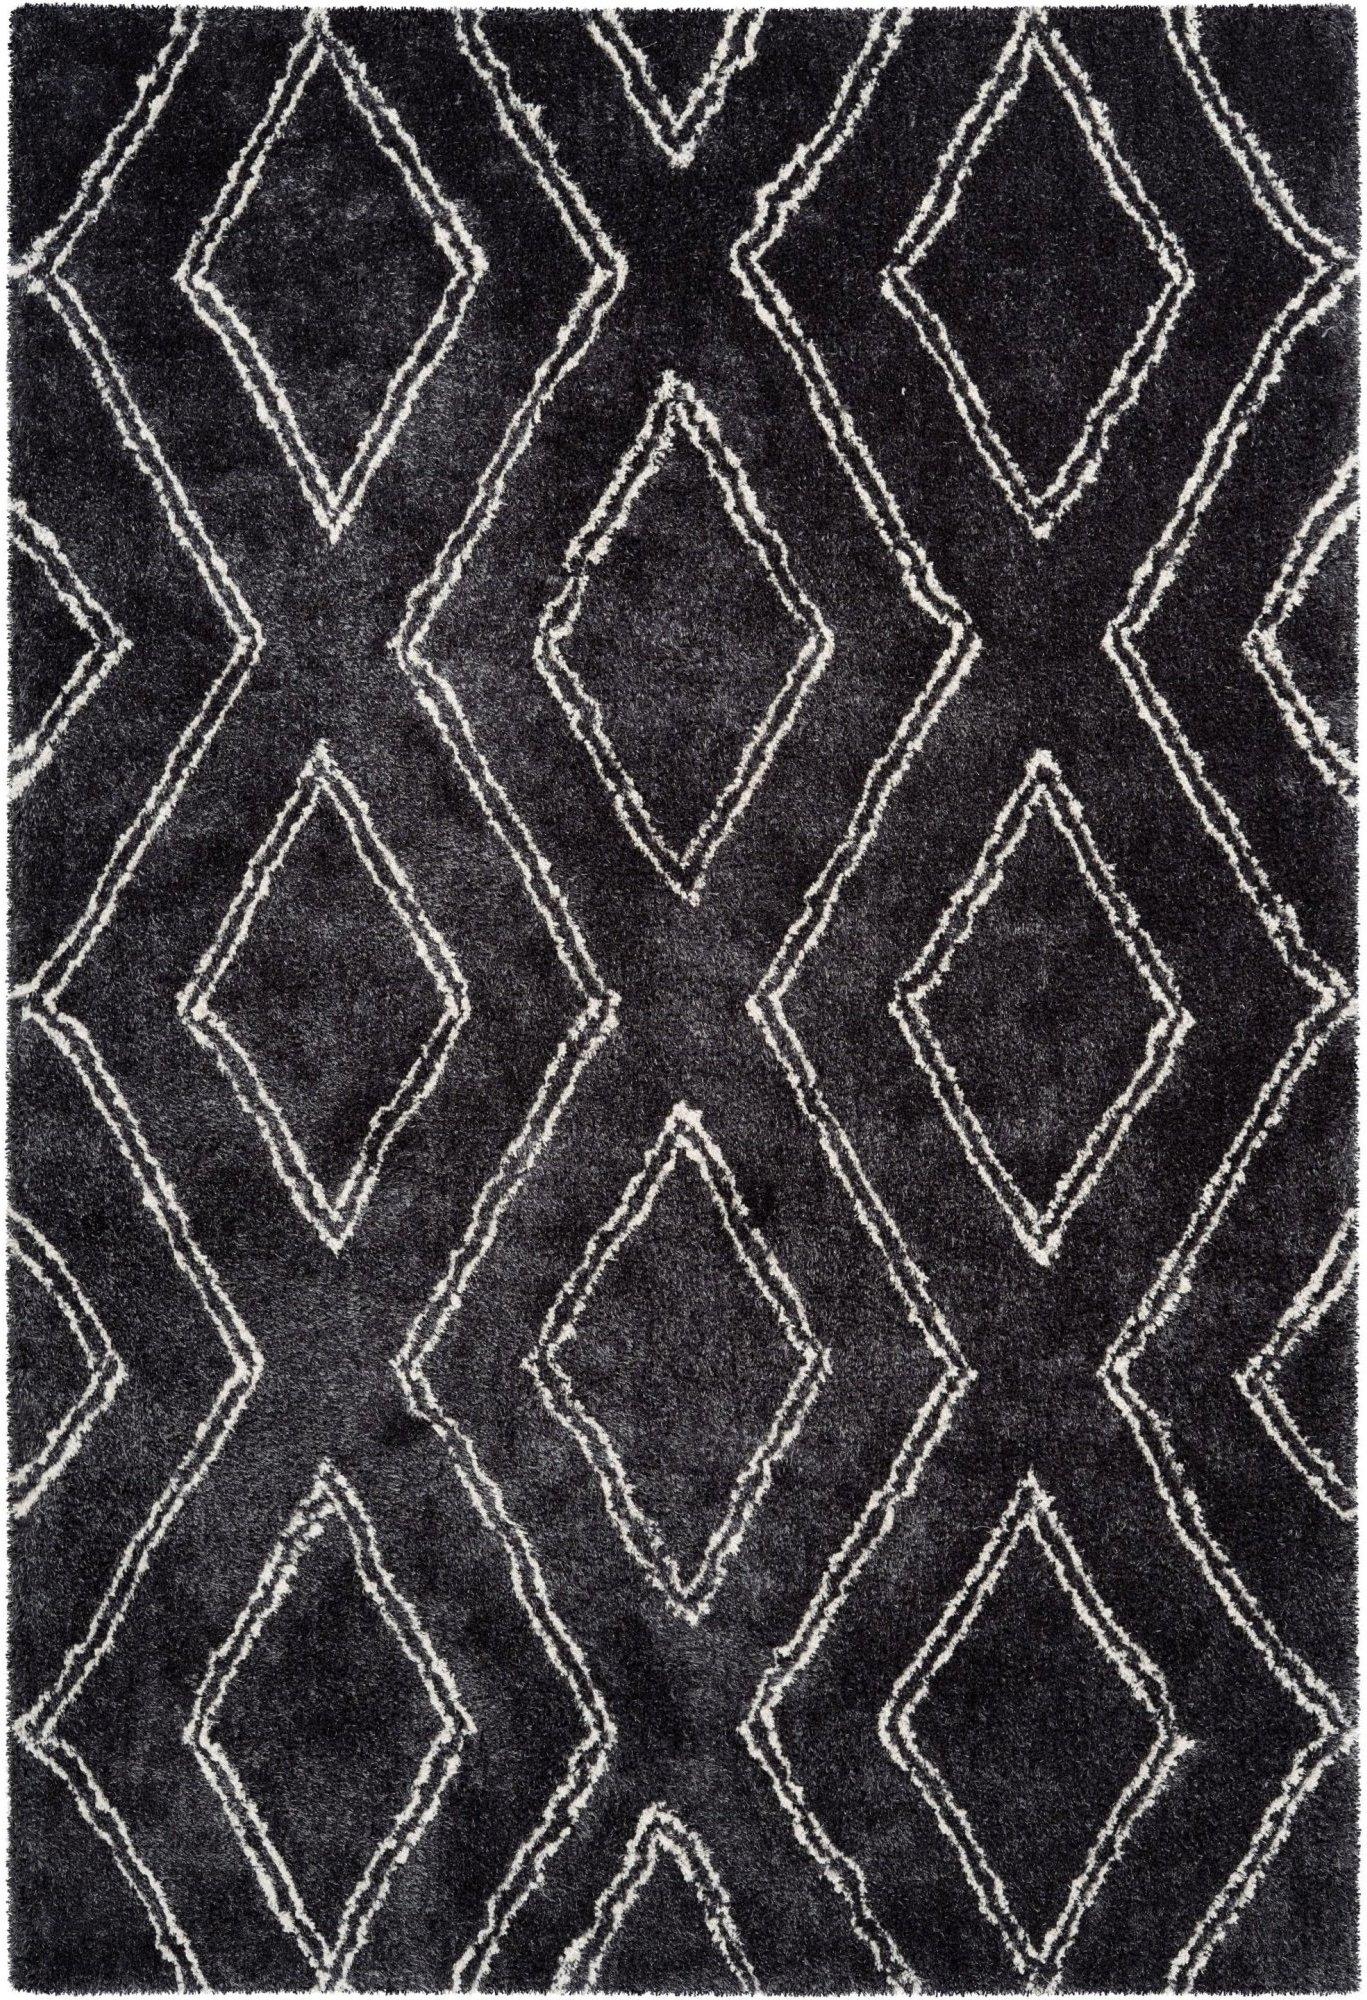 Tapis en polyester anthracite 200x290